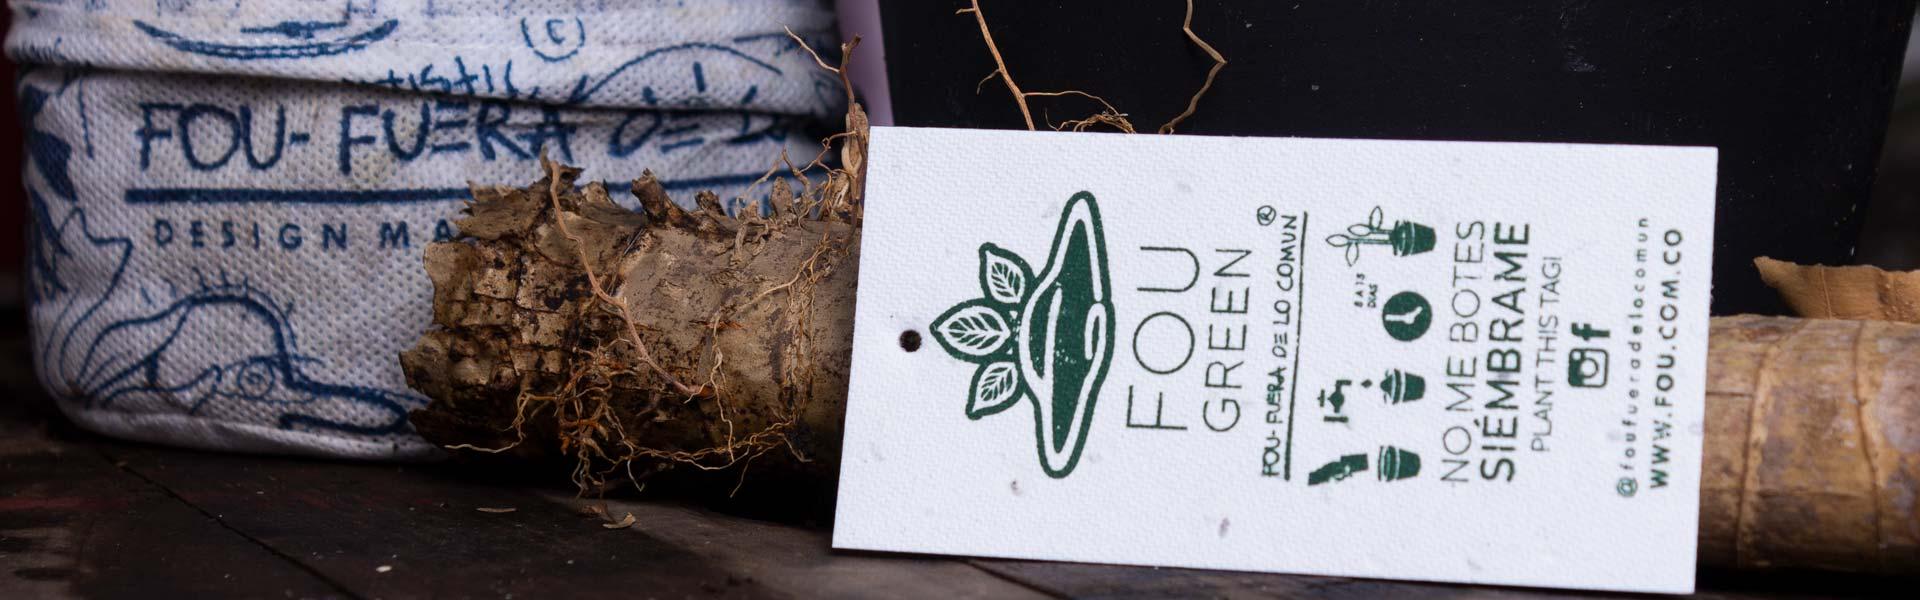 Etiqueta para ser plantada en nuestras bolsas biodegradables